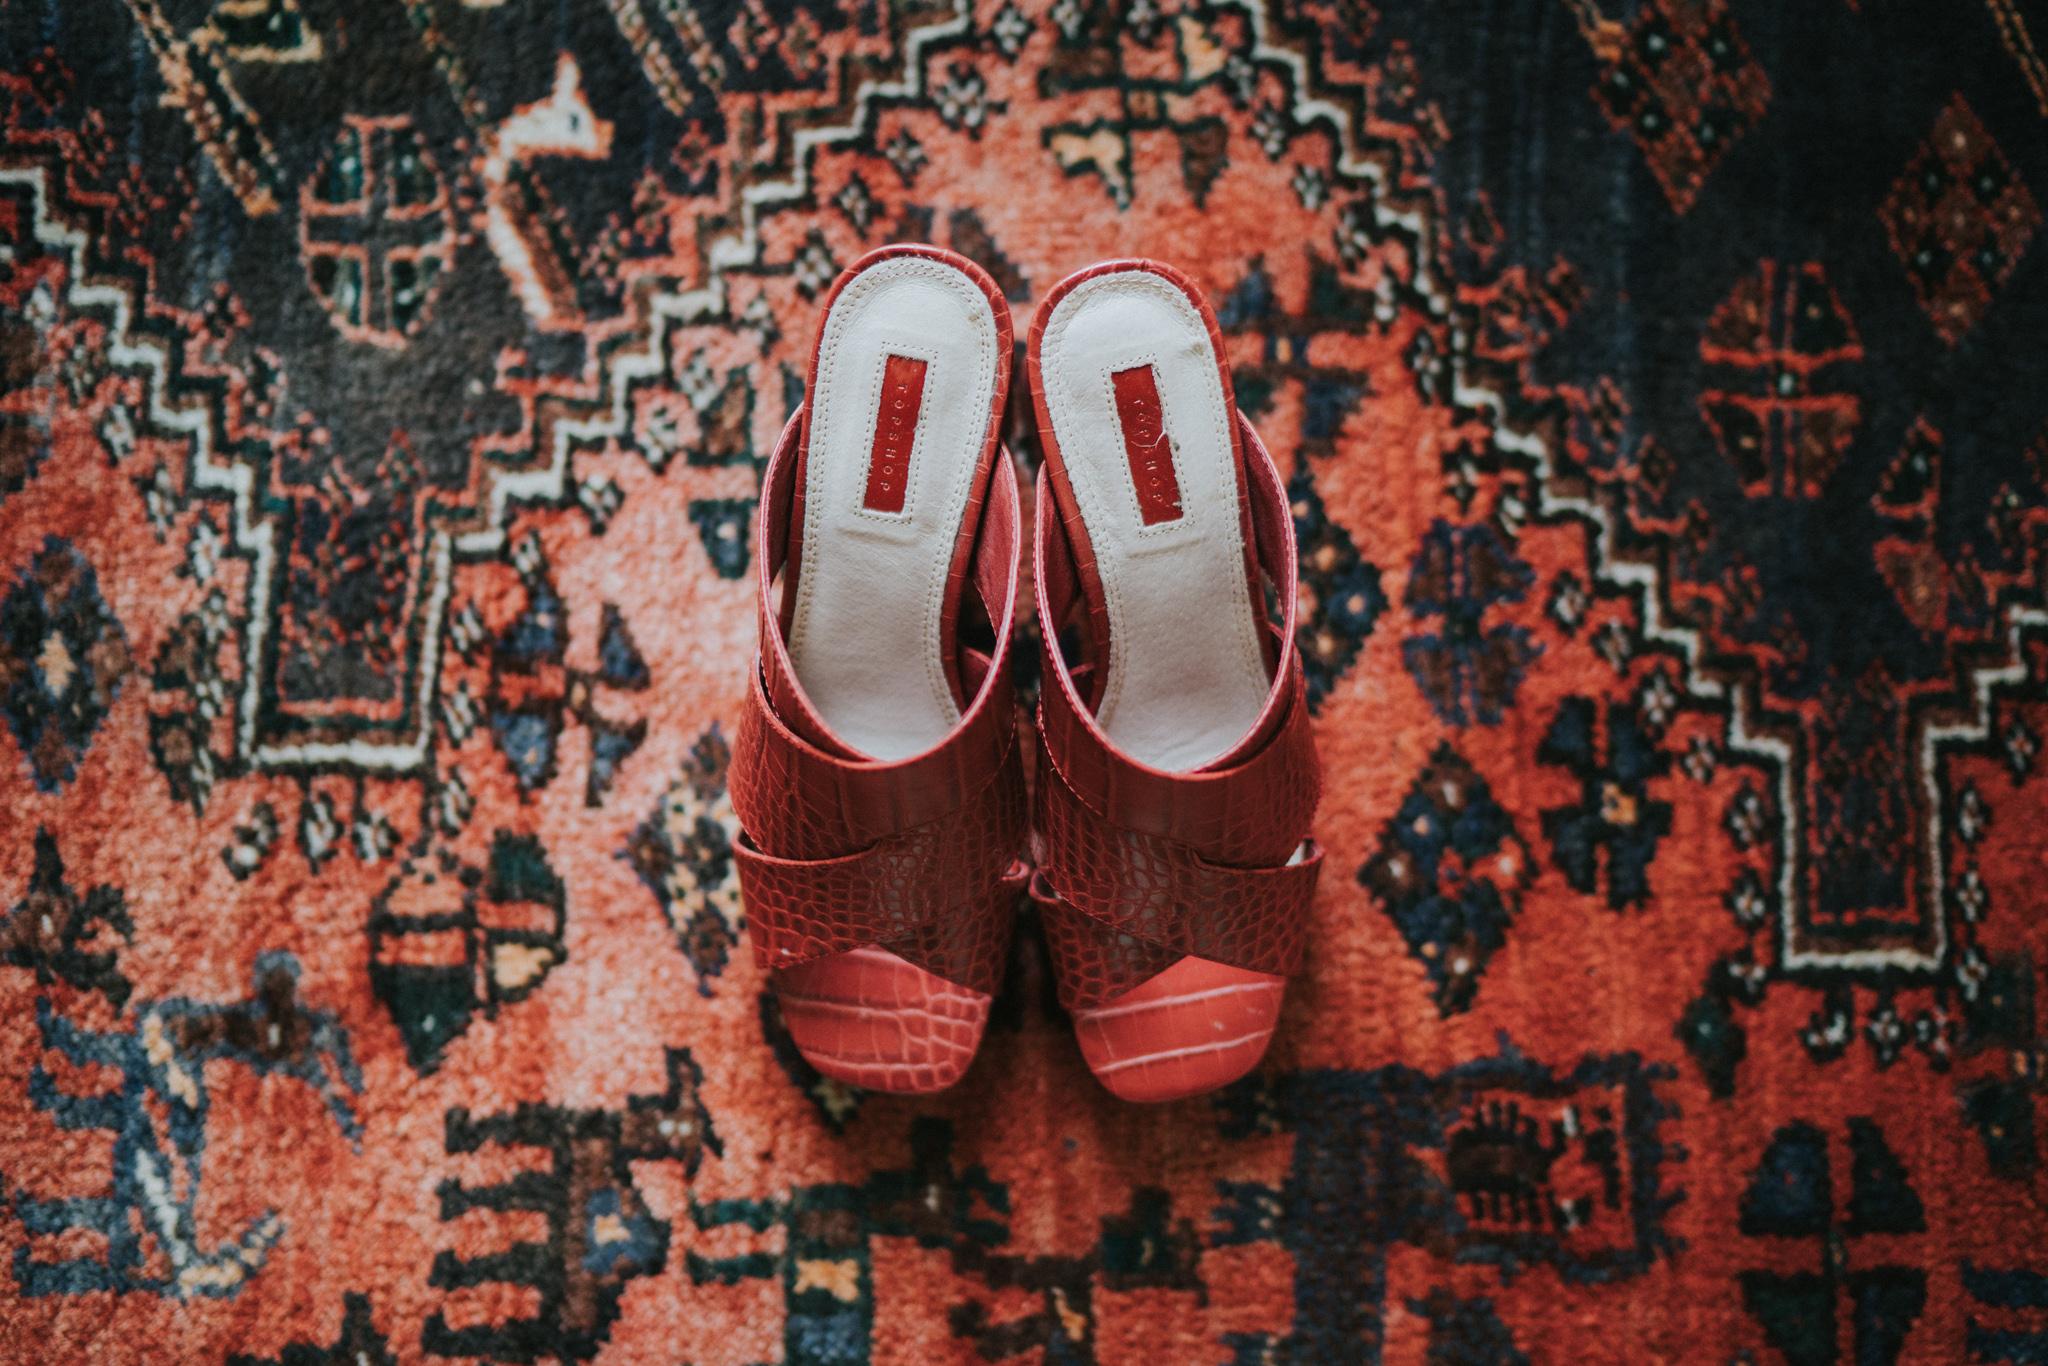 emi-Jack-boho-diy-wedding-eggington-house-grace-elizabeth-colchester-essex-alternative-wedding-photographer-suffolk-norfolk-devon (1 of 56).jpg